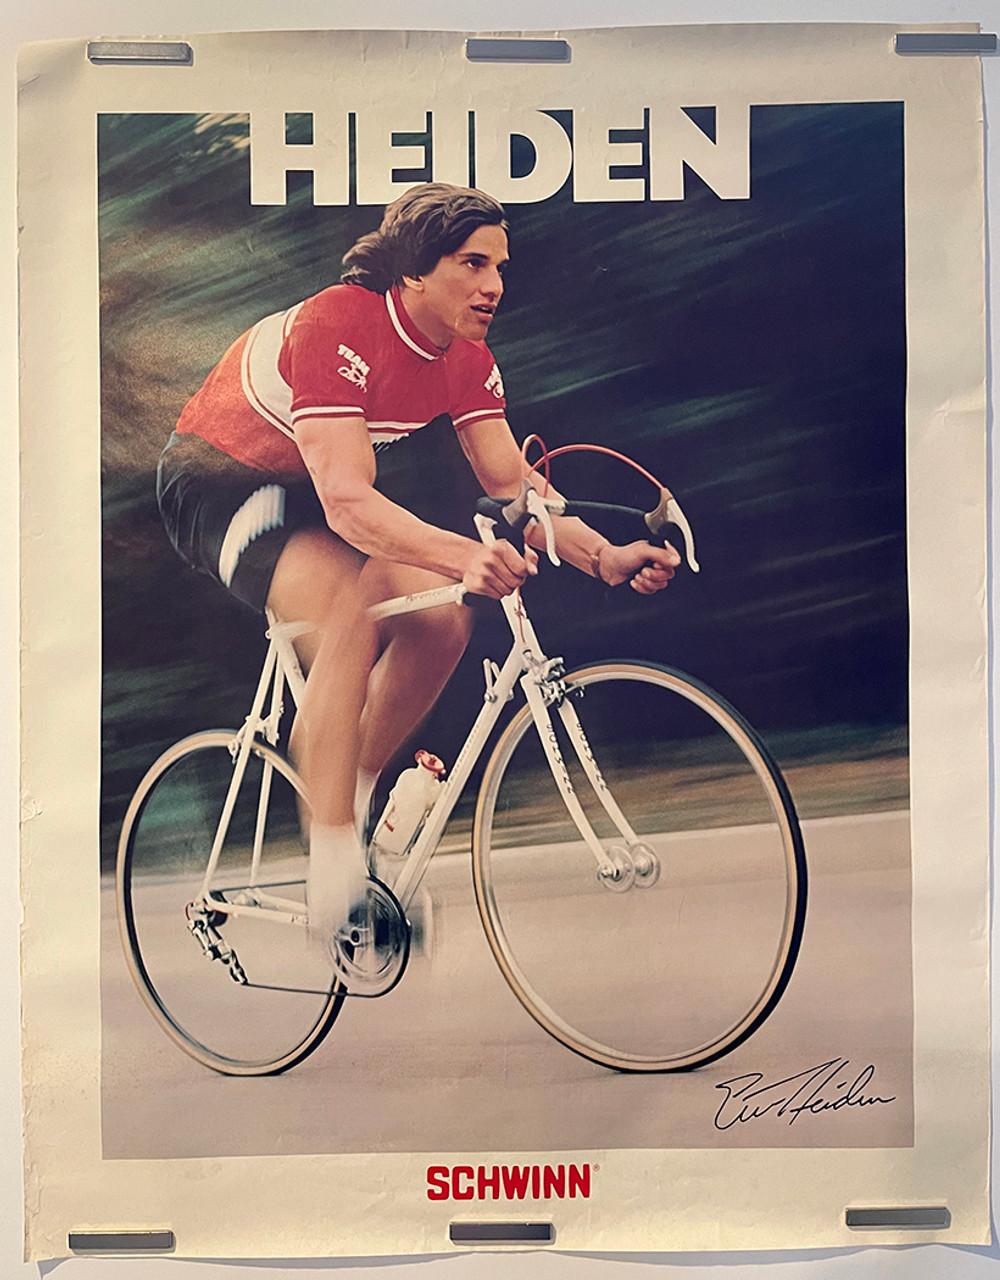 Eric Heiden riding a Schwinn Paramont with Campy Super record